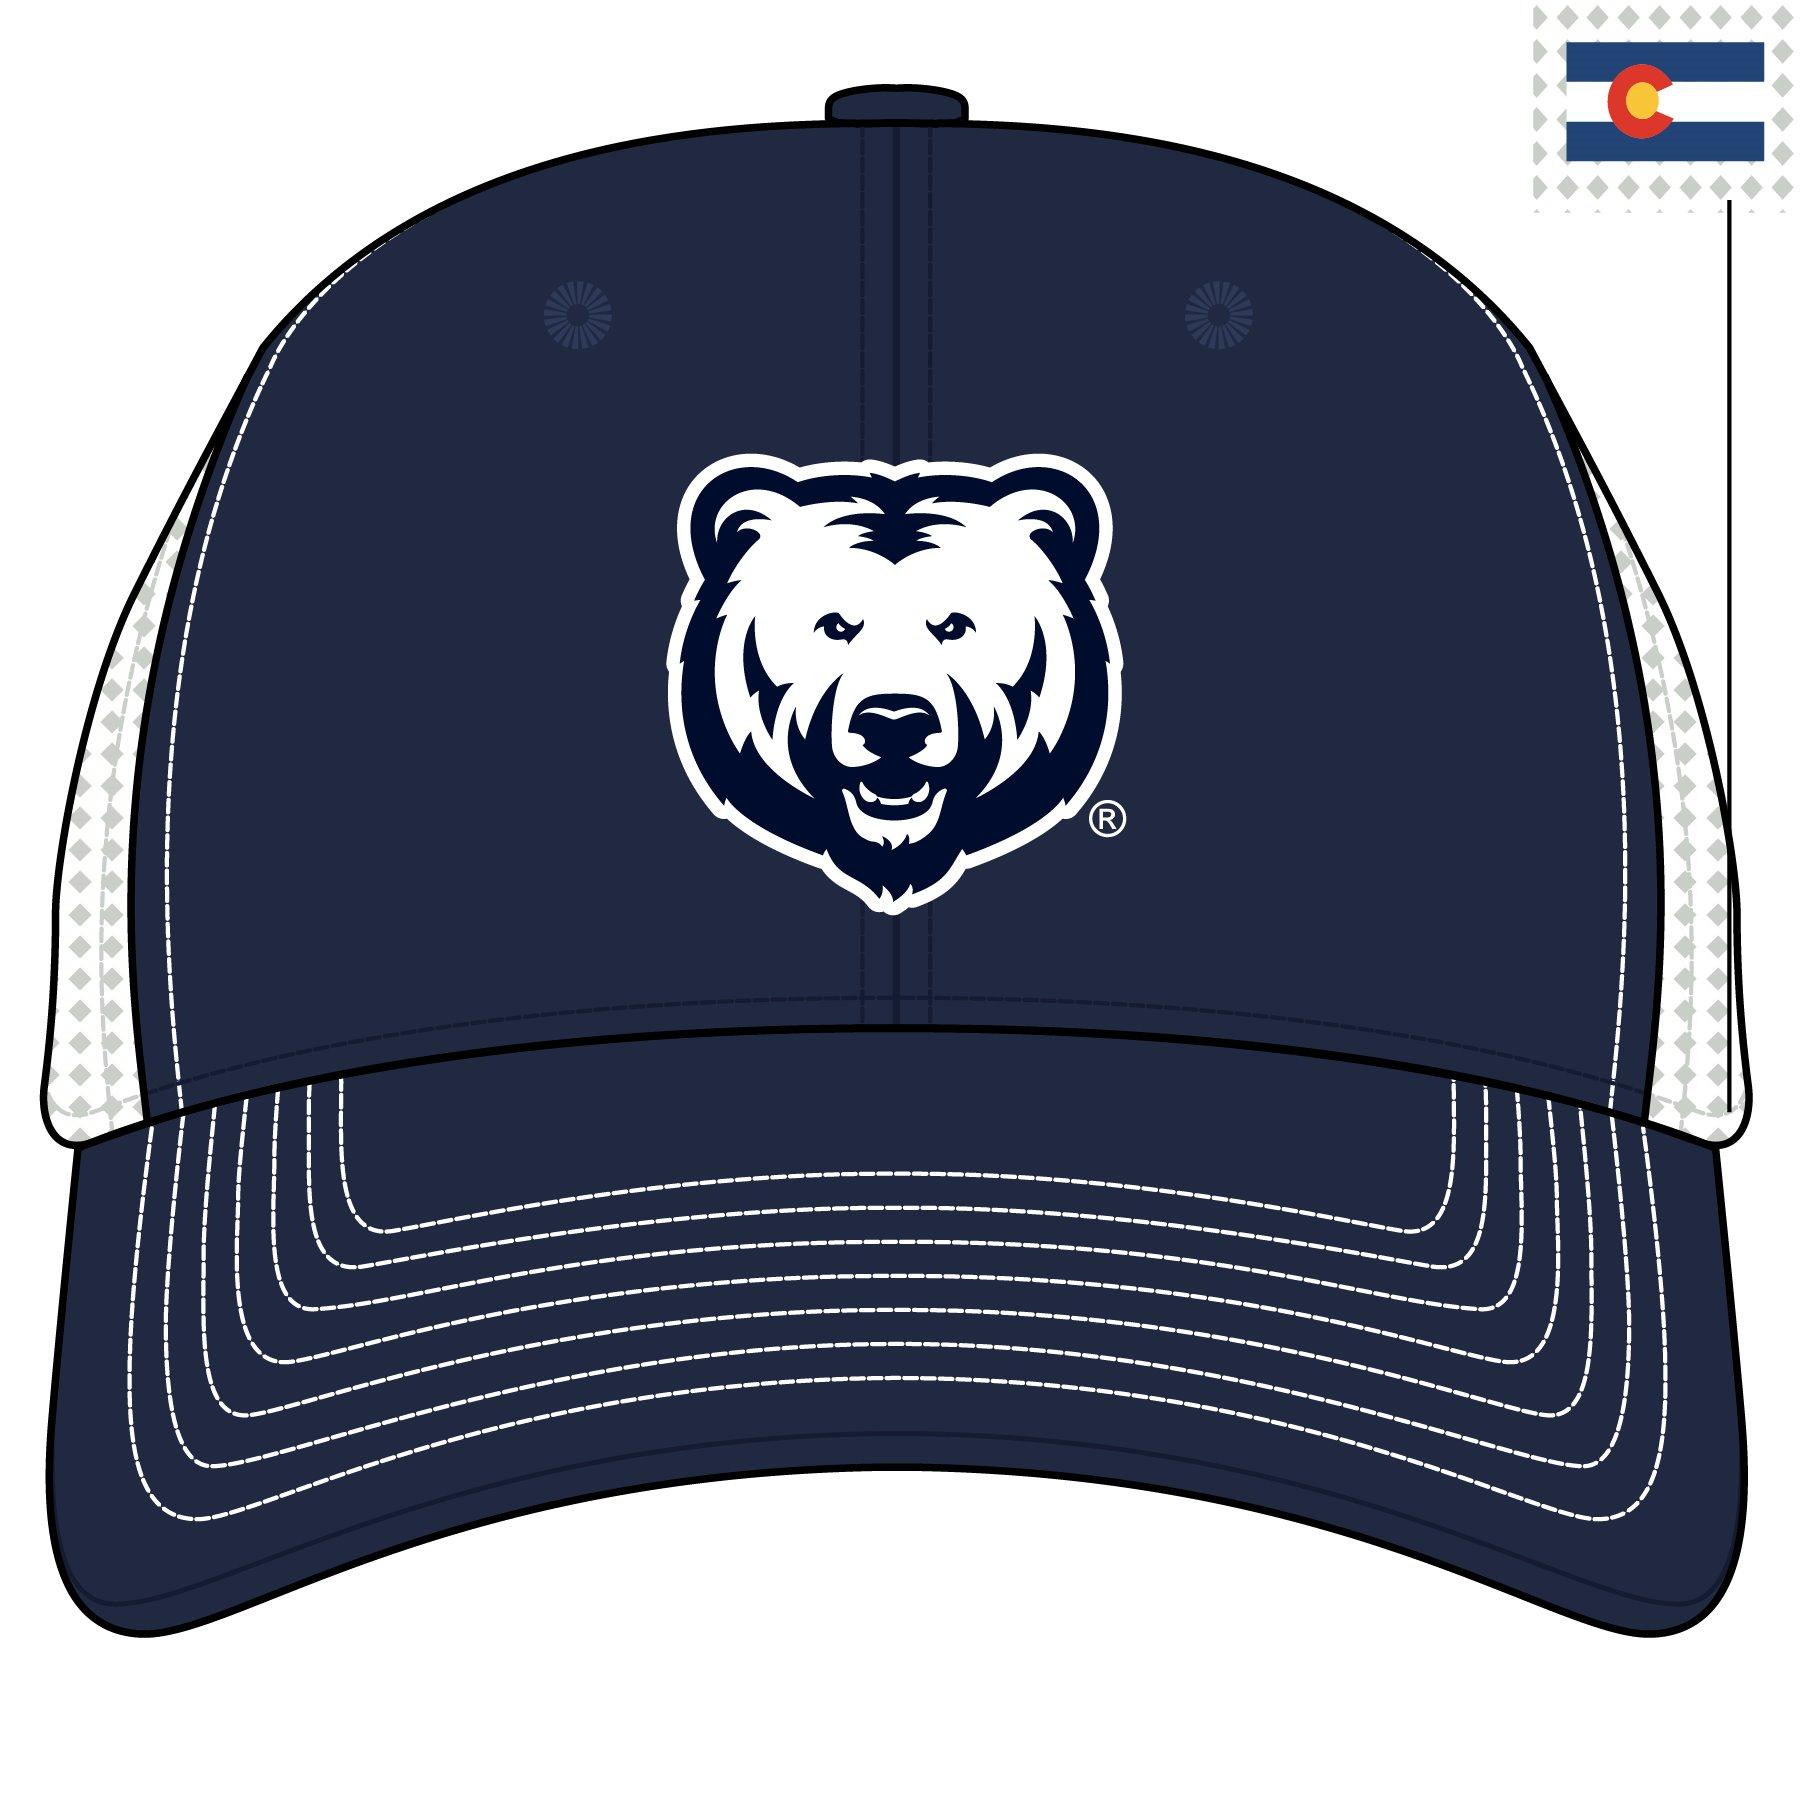 UNC Bears Sideline Cap